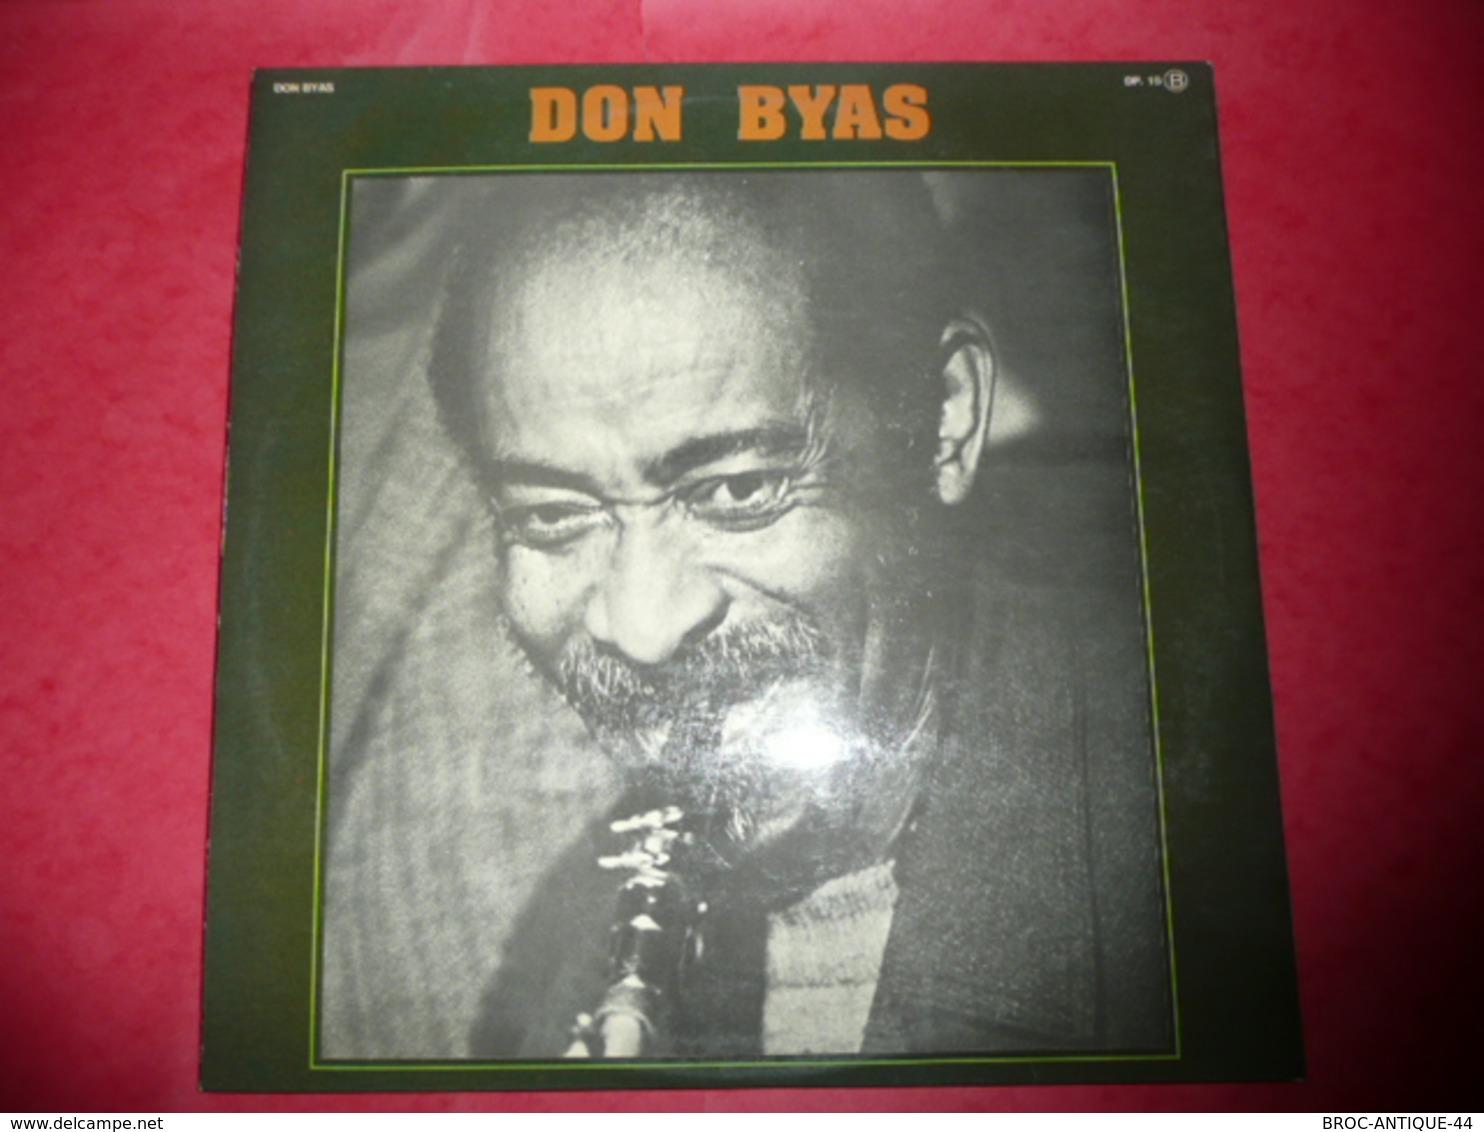 LP33 N°1060 - DON BYAS - MEMORIAL - COMPILATION 2 LP 24 TITRES JAZZ - Jazz